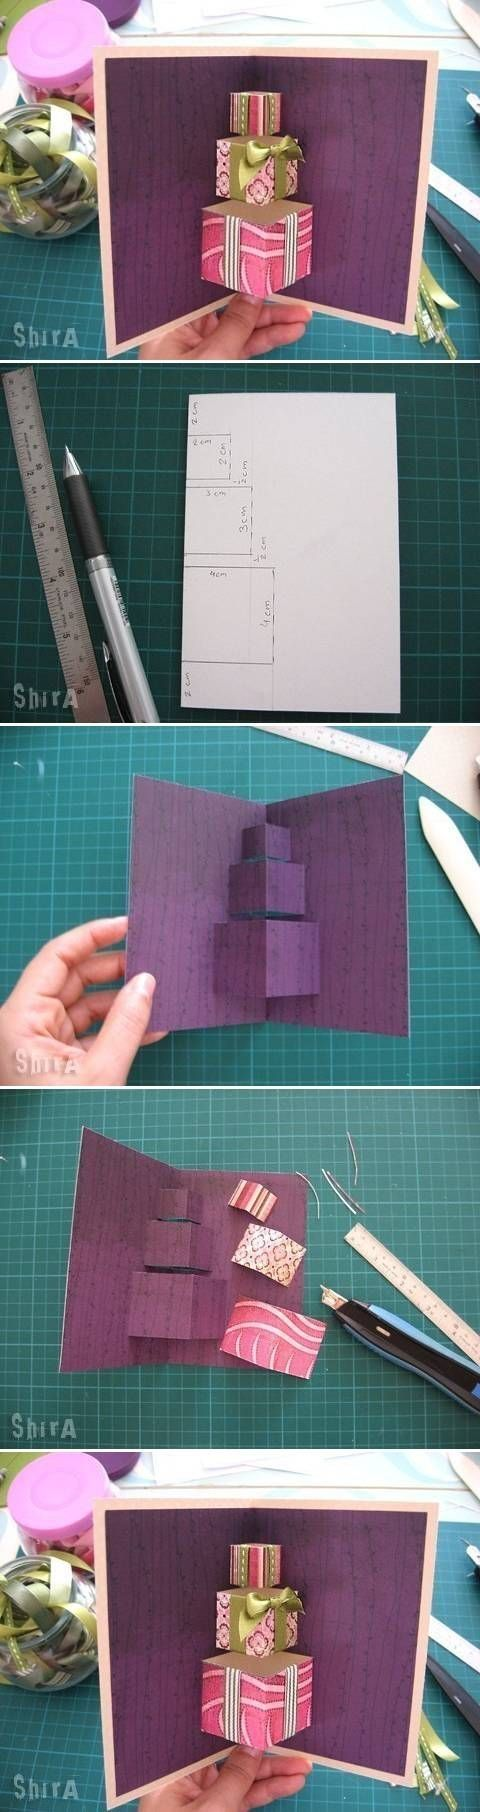 (Artesanía por tb Sally) http://www.librairie-interactive.com/cartes-de-noel-3d-sapins-et-cadeaux